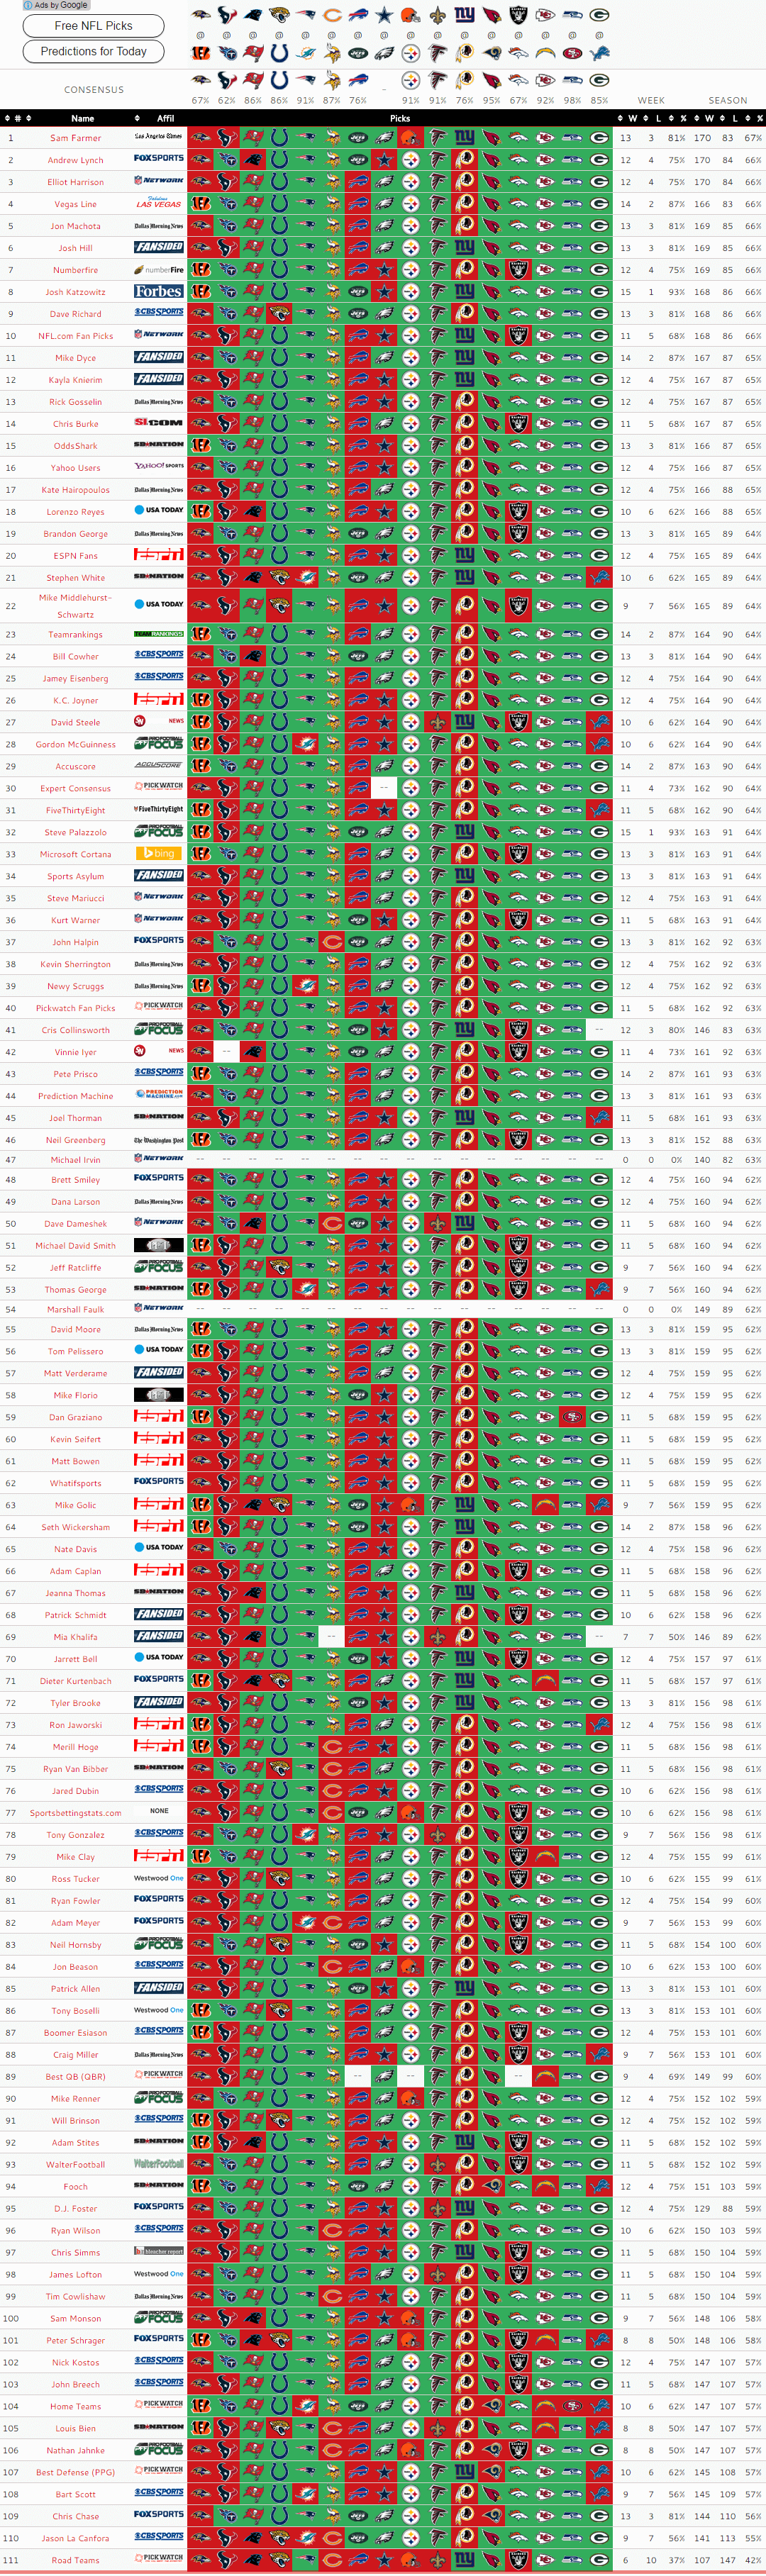 Expert NFL Picks and Predictions: Week 17 | BigOnSports